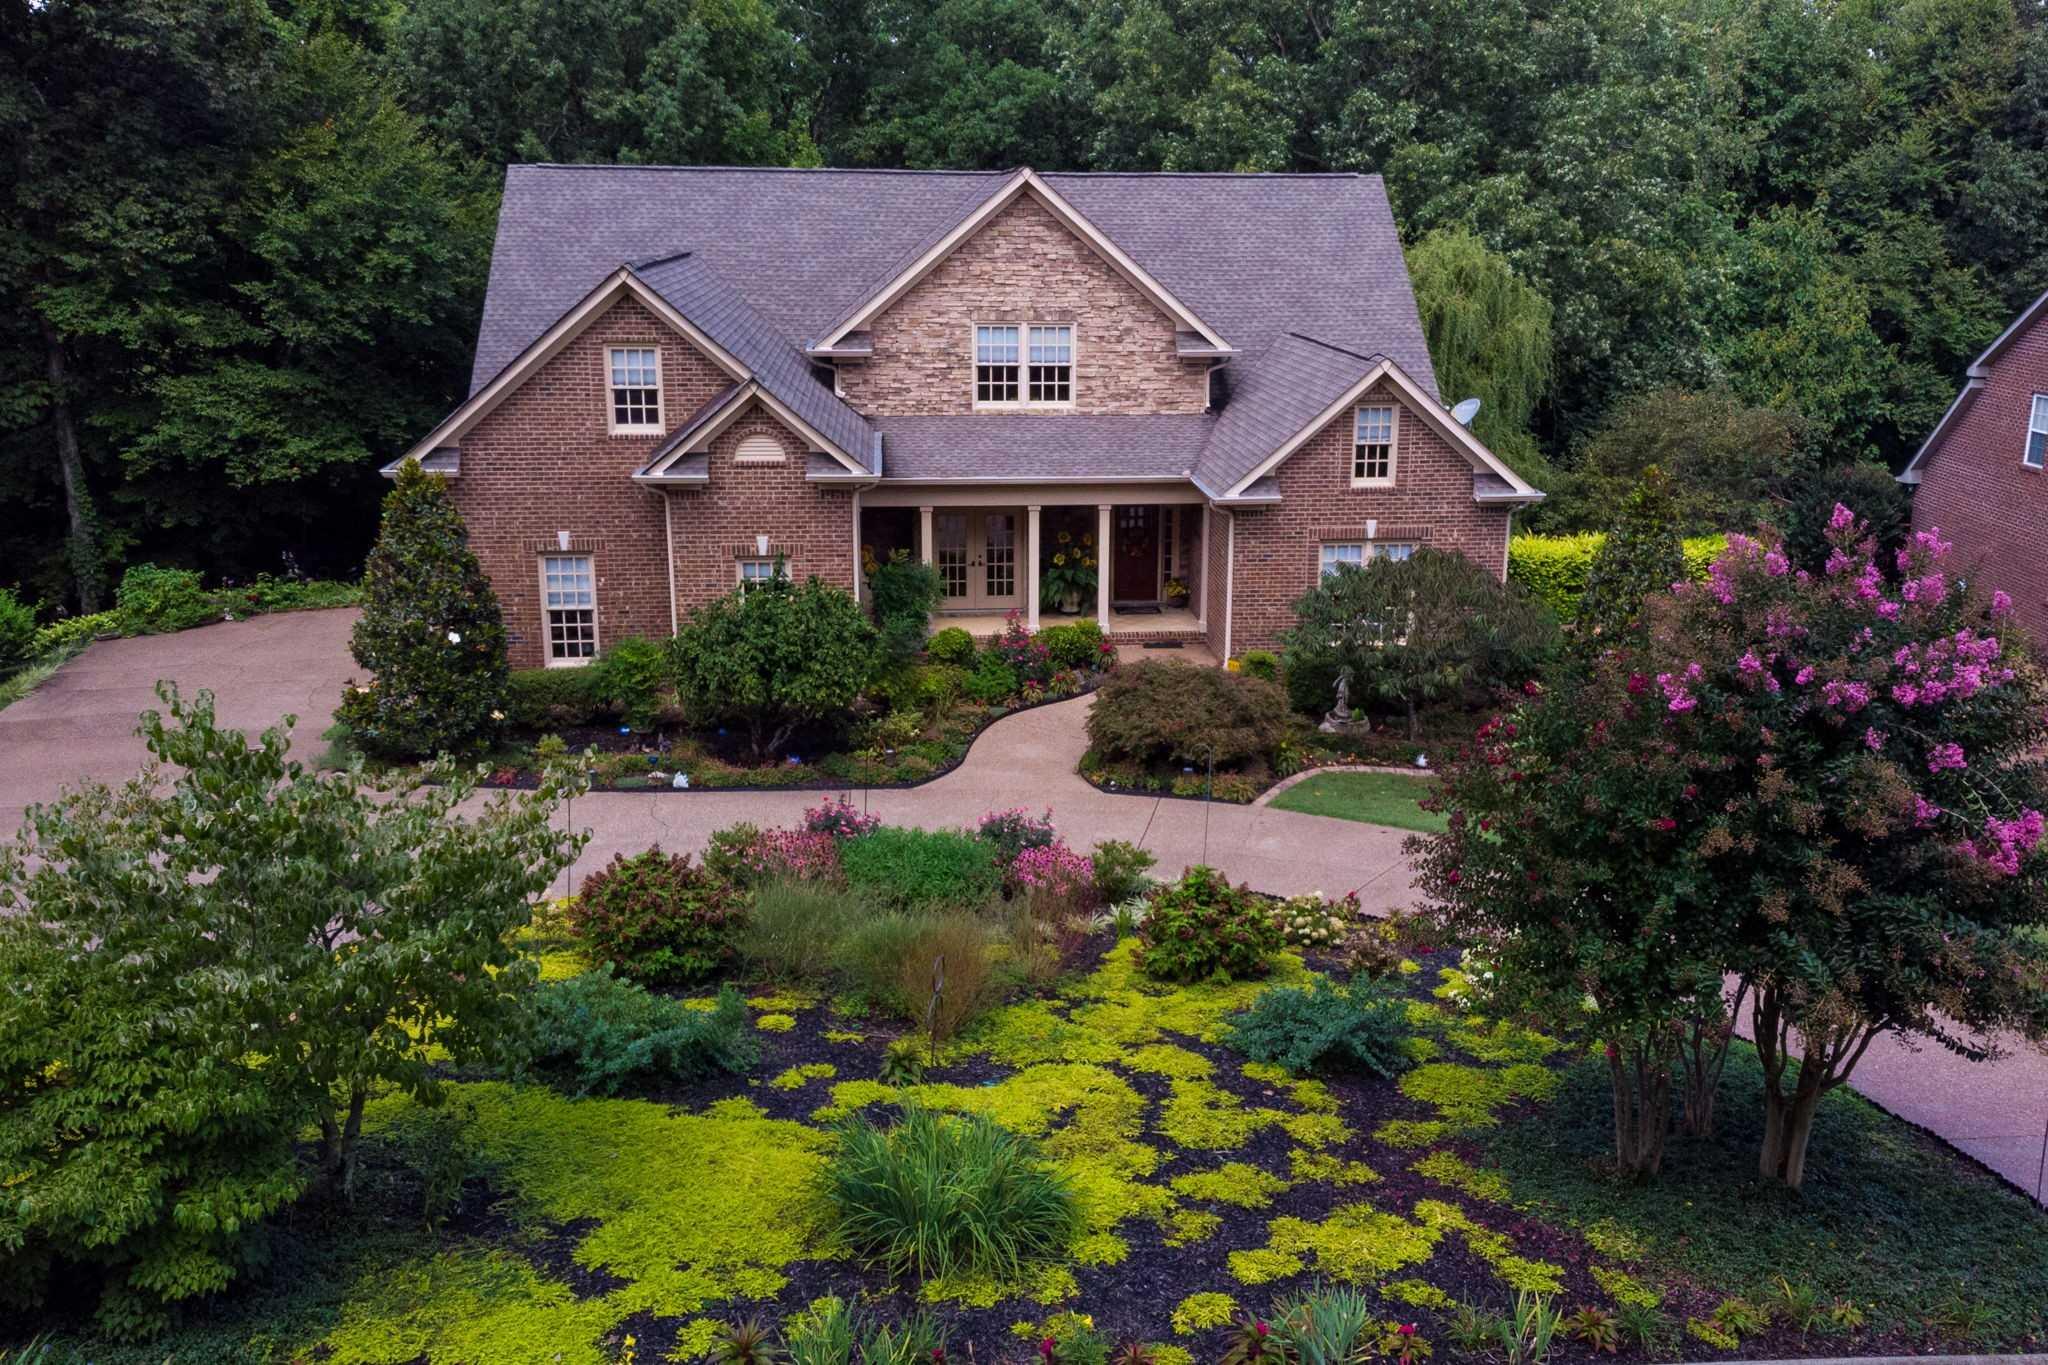 $795,000 - 4Br/5Ba -  for Sale in Elioch Ridge Phase 2, Goodlettsville